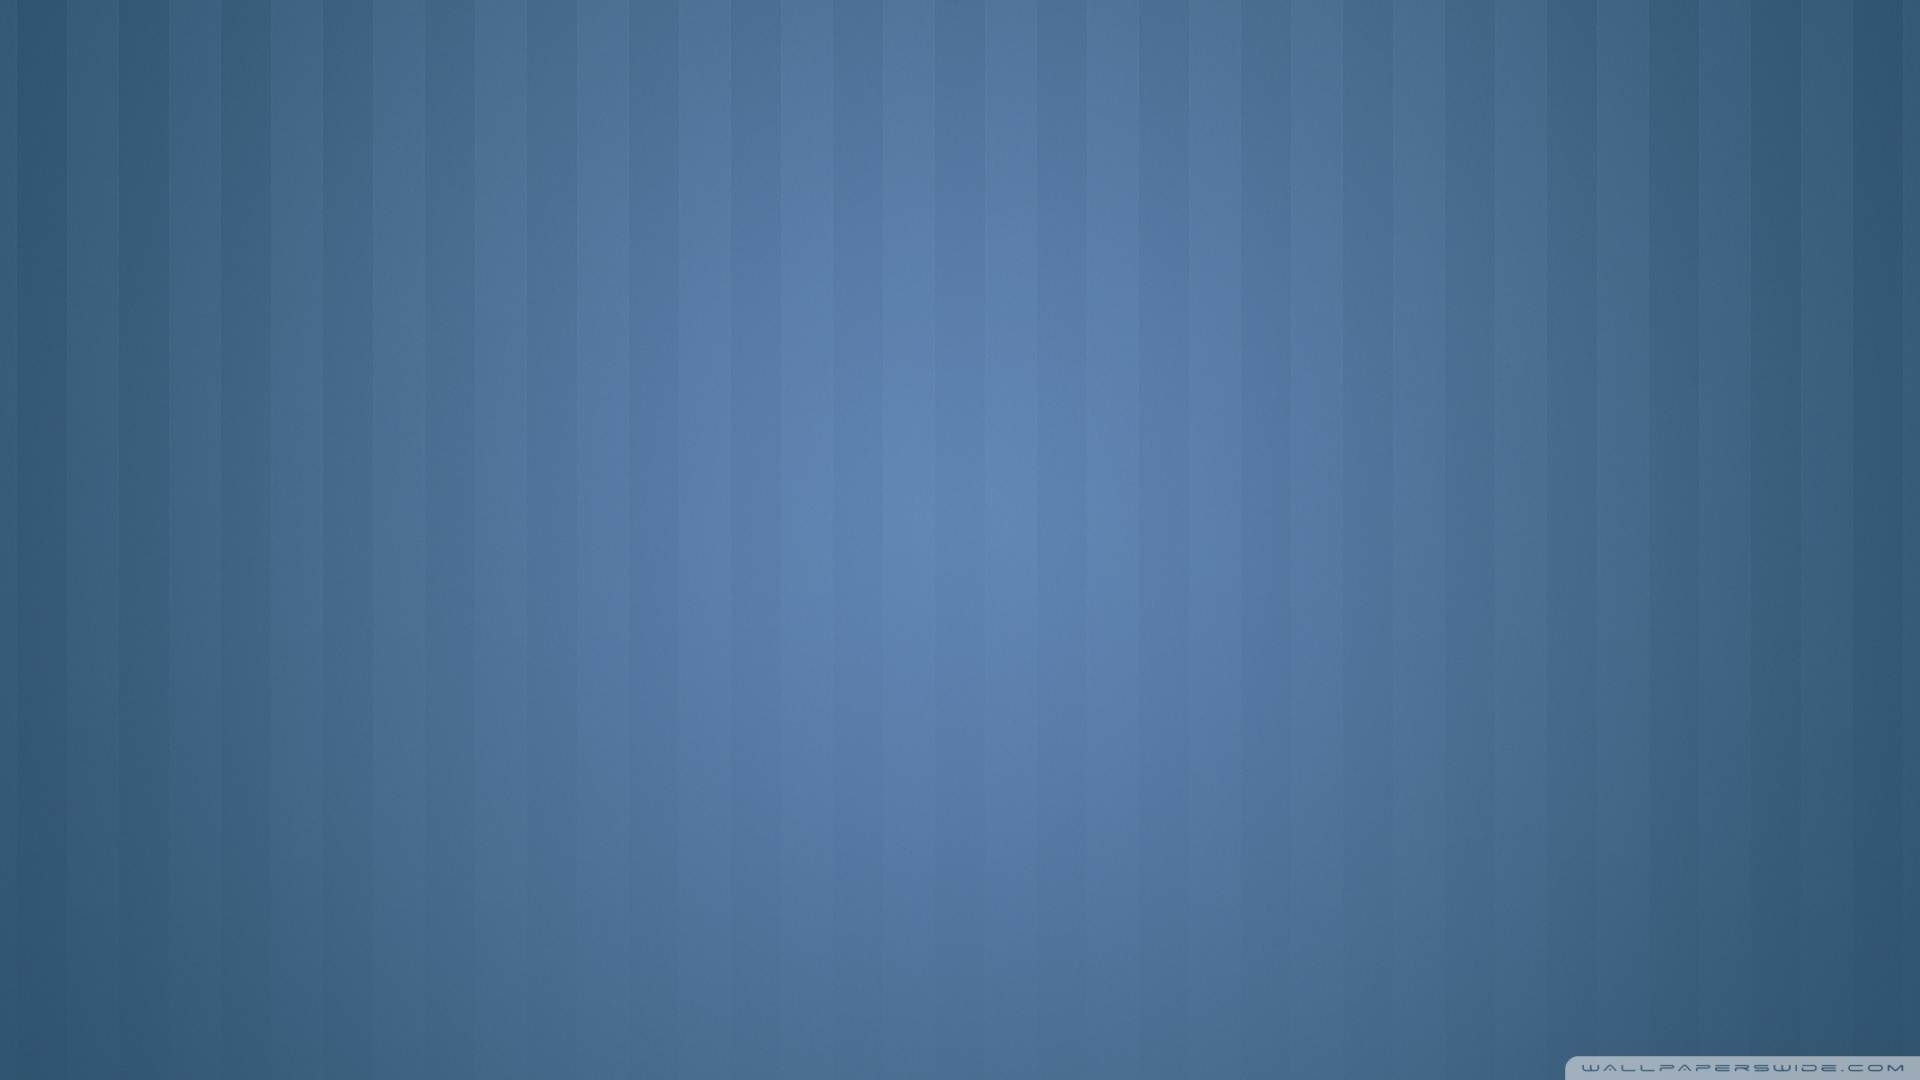 Wallpapers Backgrounds   Blue Zebra Stripes Wallpaper Desktop 1920x1080